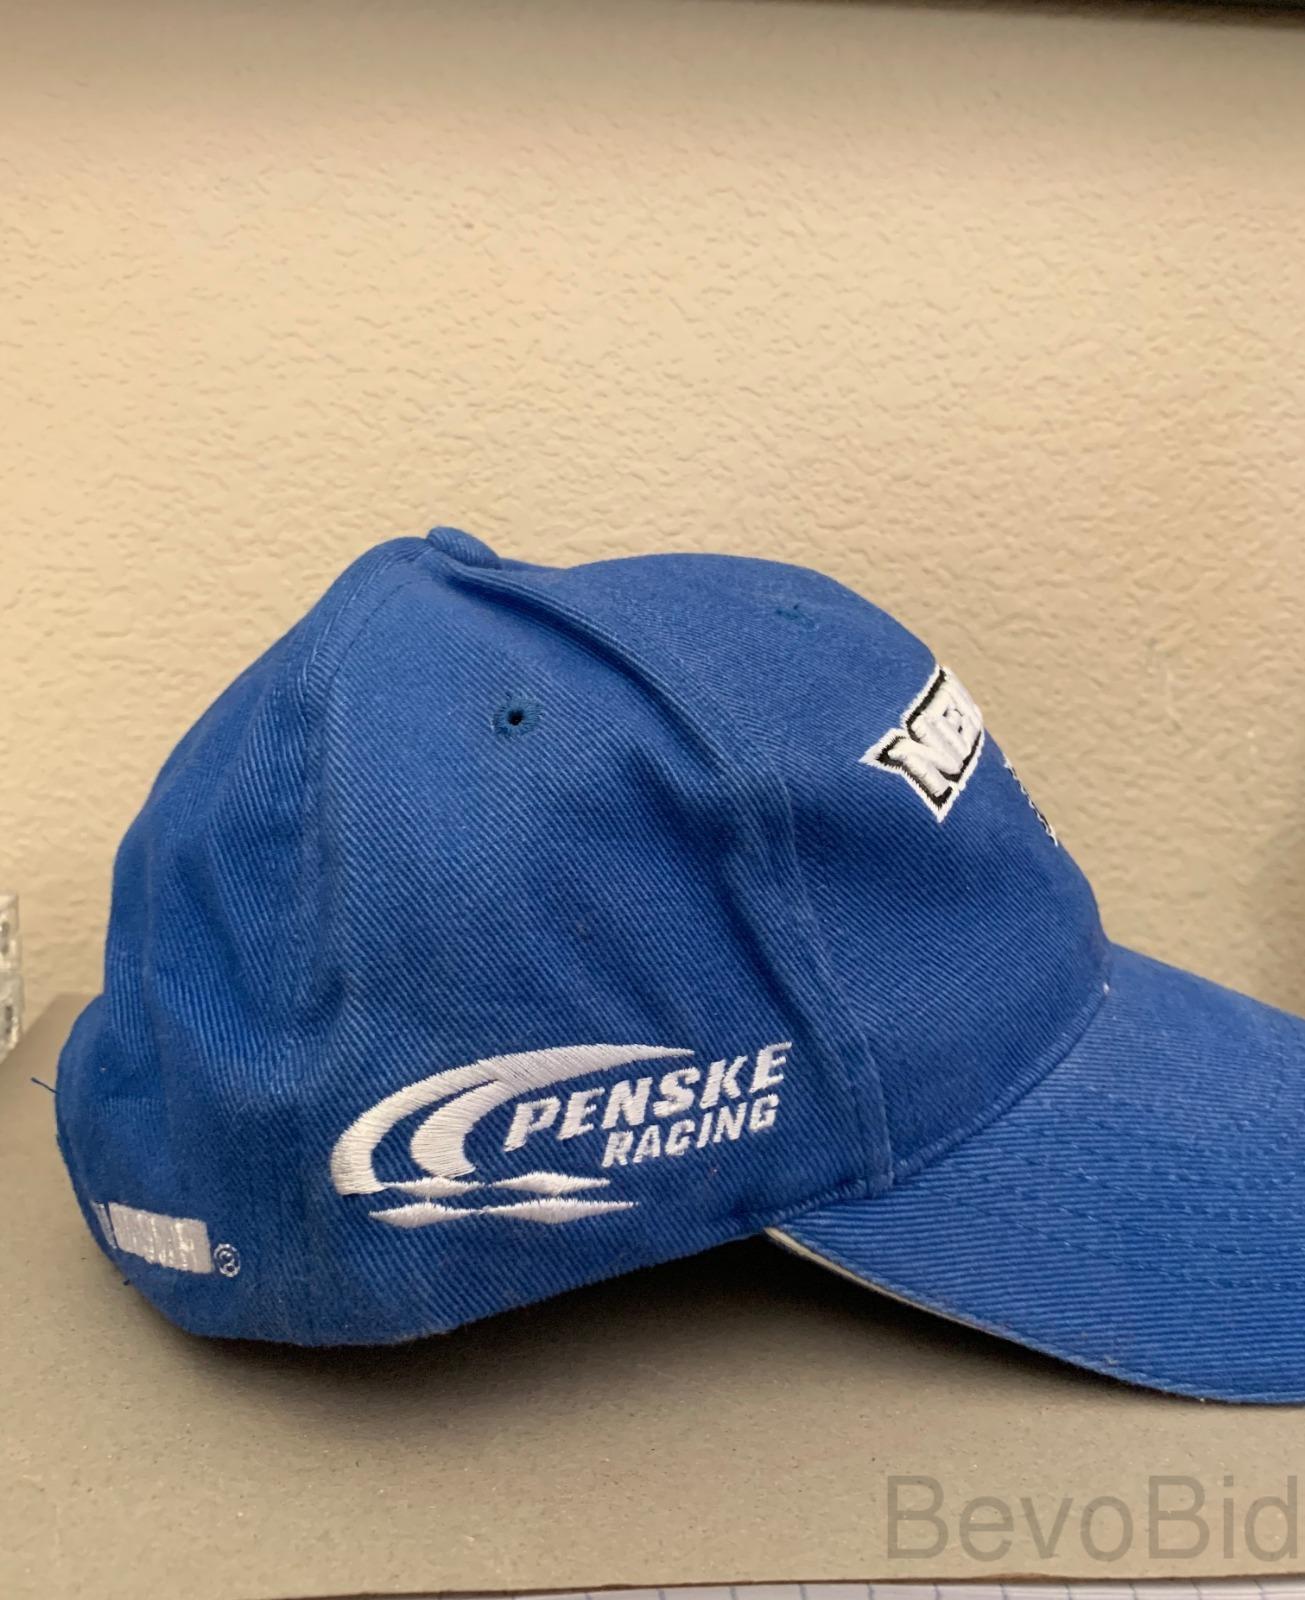 Newman #12 Blue Cap, Alltel Racing, Penske Racing,